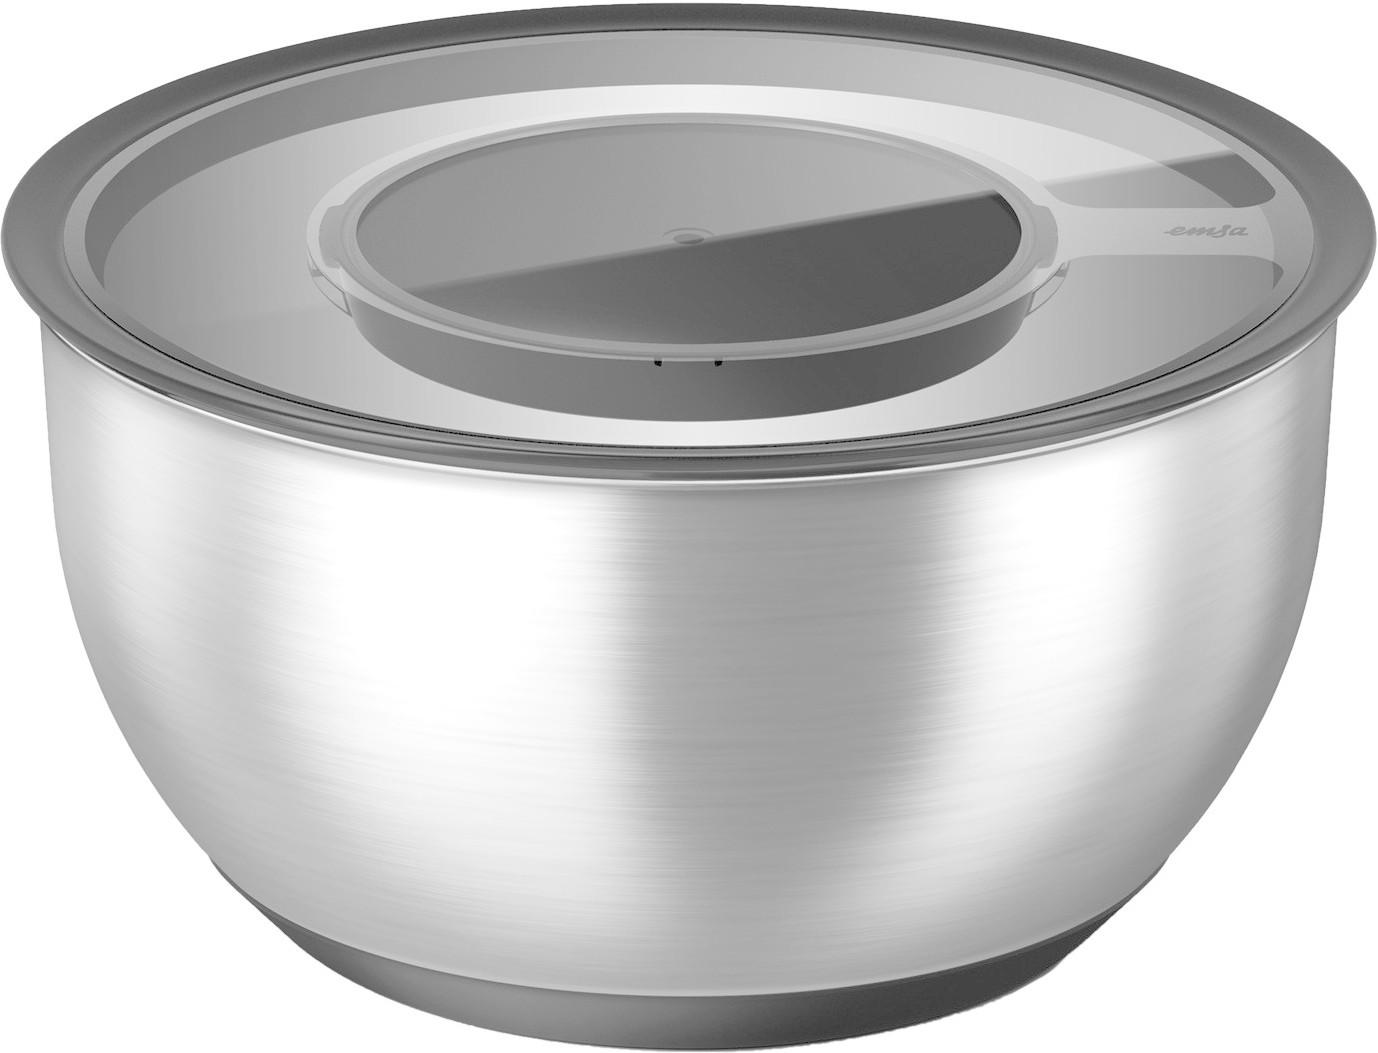 Image of Emsa Accenta Salad Bowl 26 cm